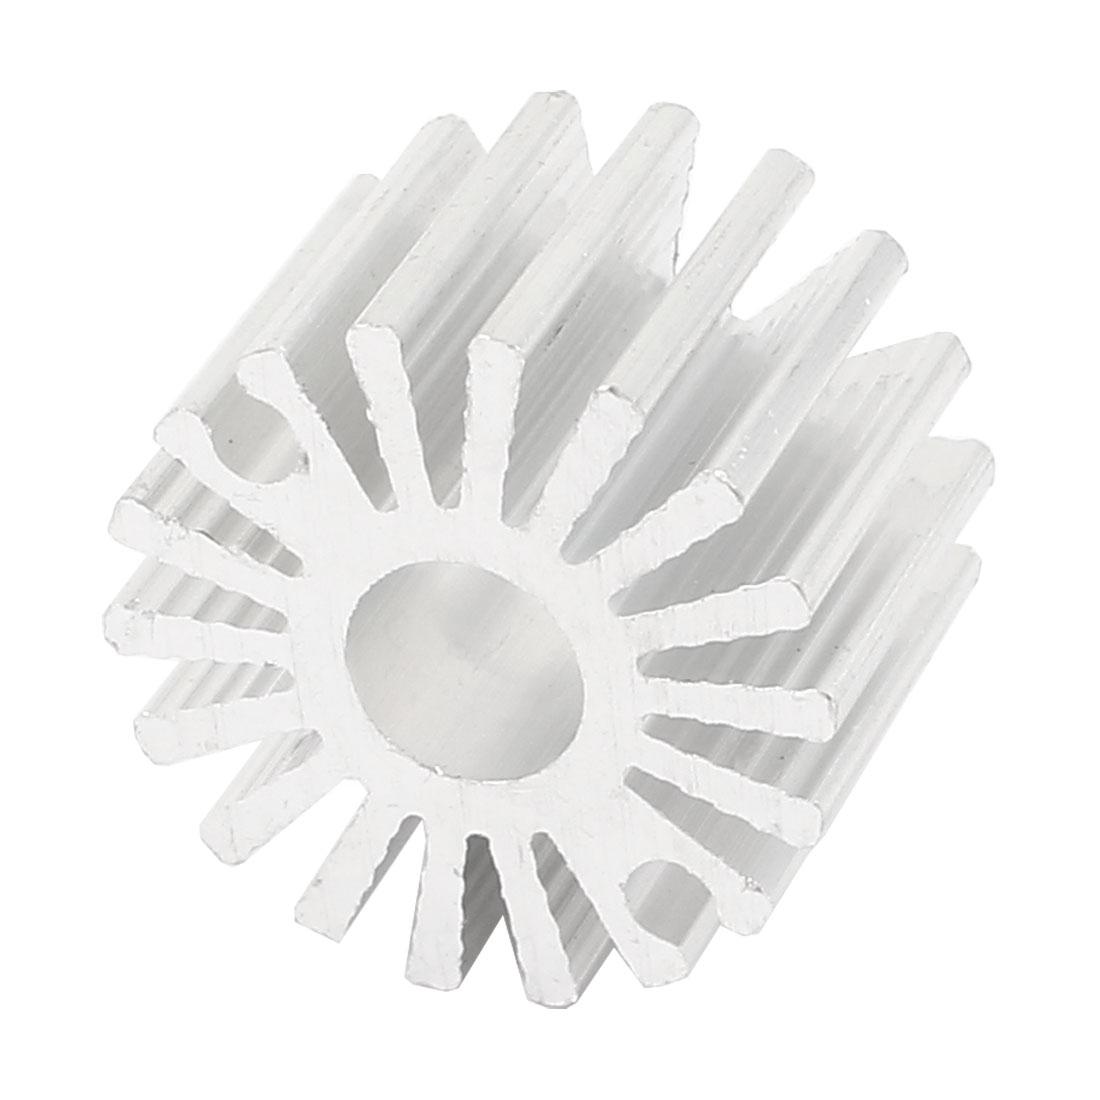 19.5mm x 13mm Sunflower 0.5W Power LED Light Heatsink Aluminium Cooling Fin